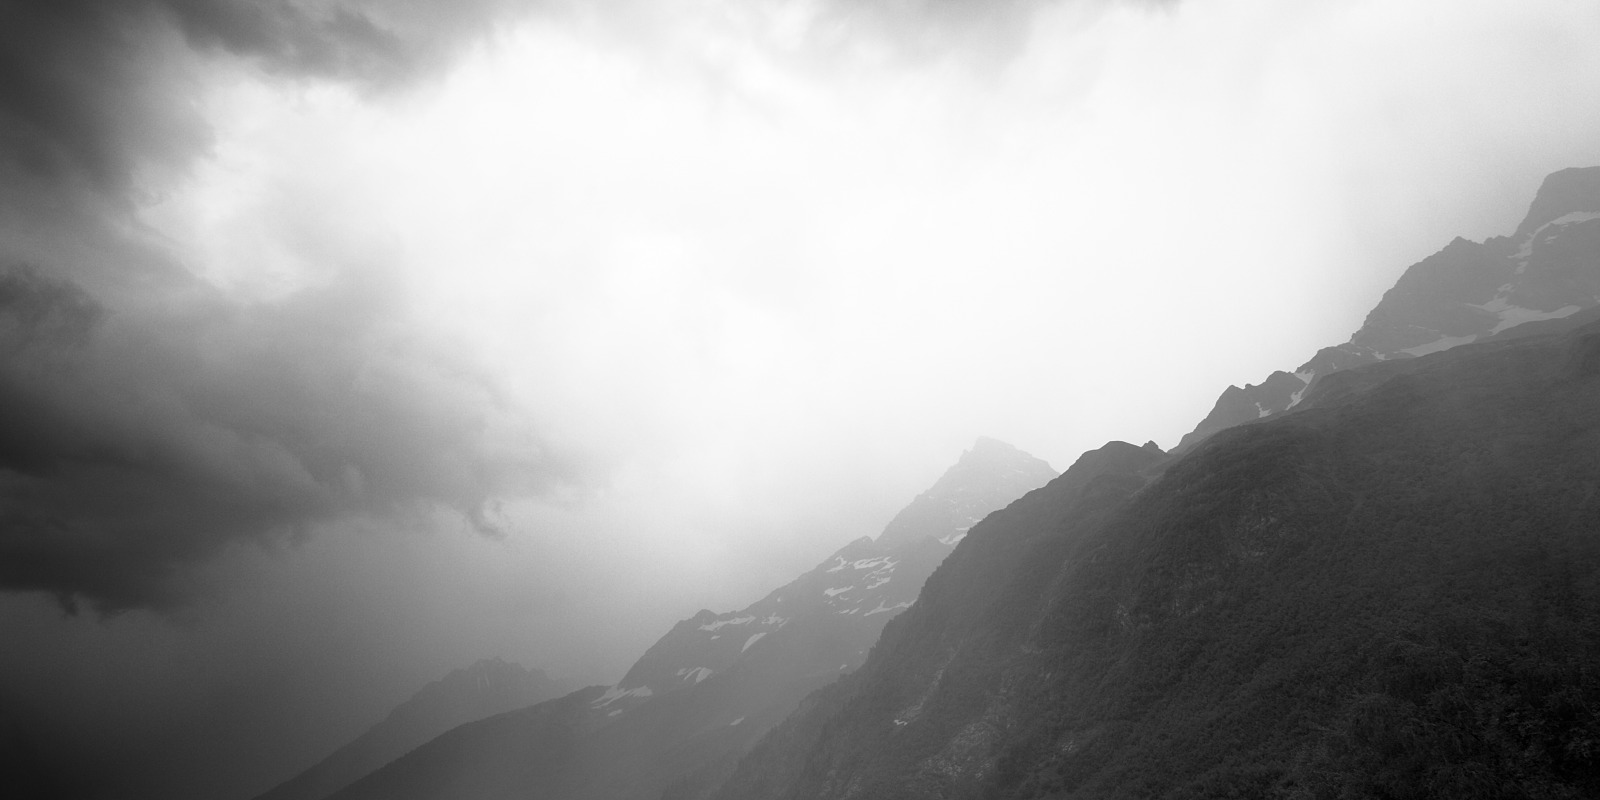 Mountains in rain